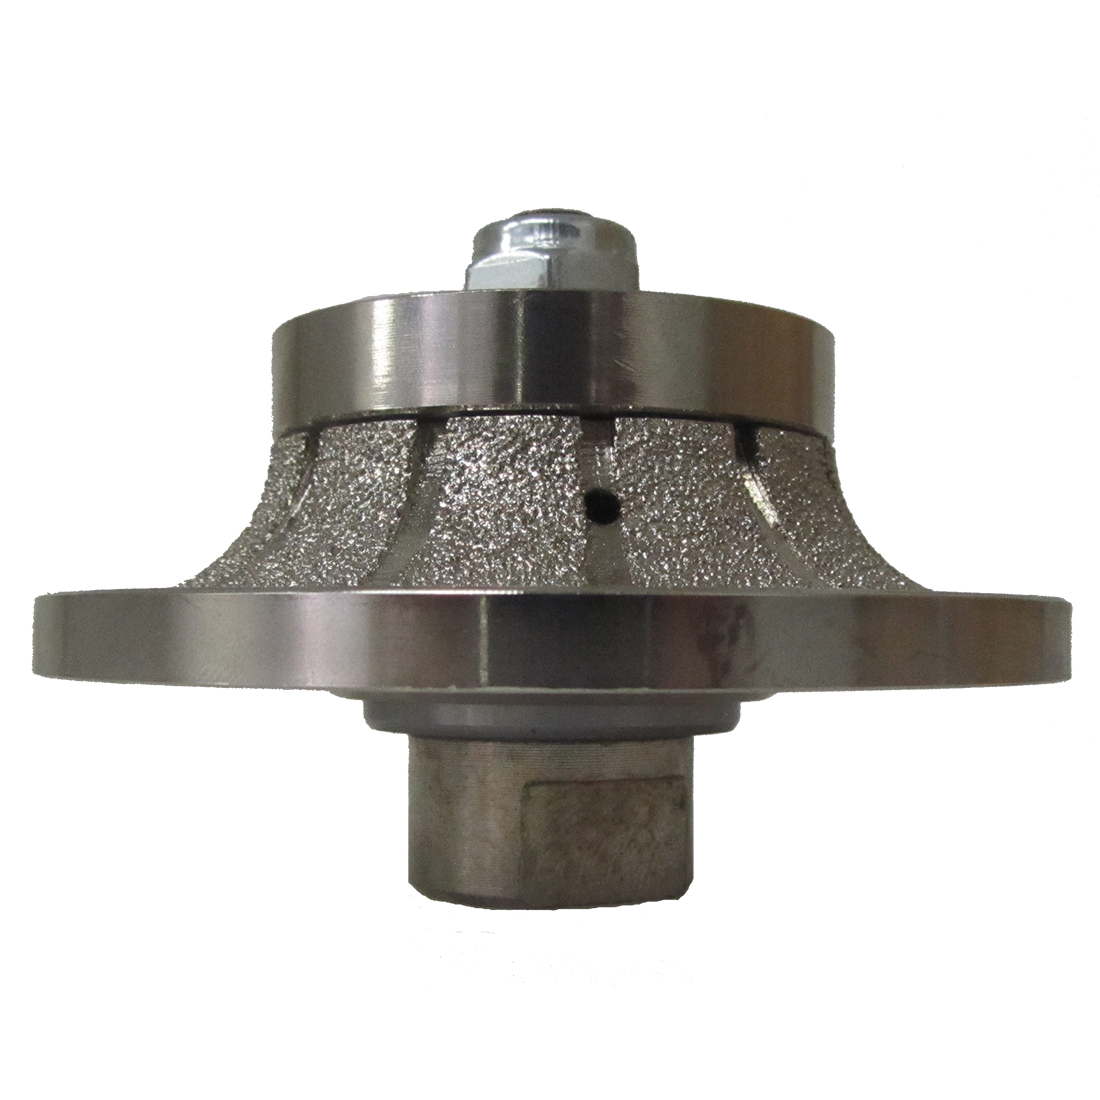 Diamond Router Bit For Grinder 15mm B Profile Radius